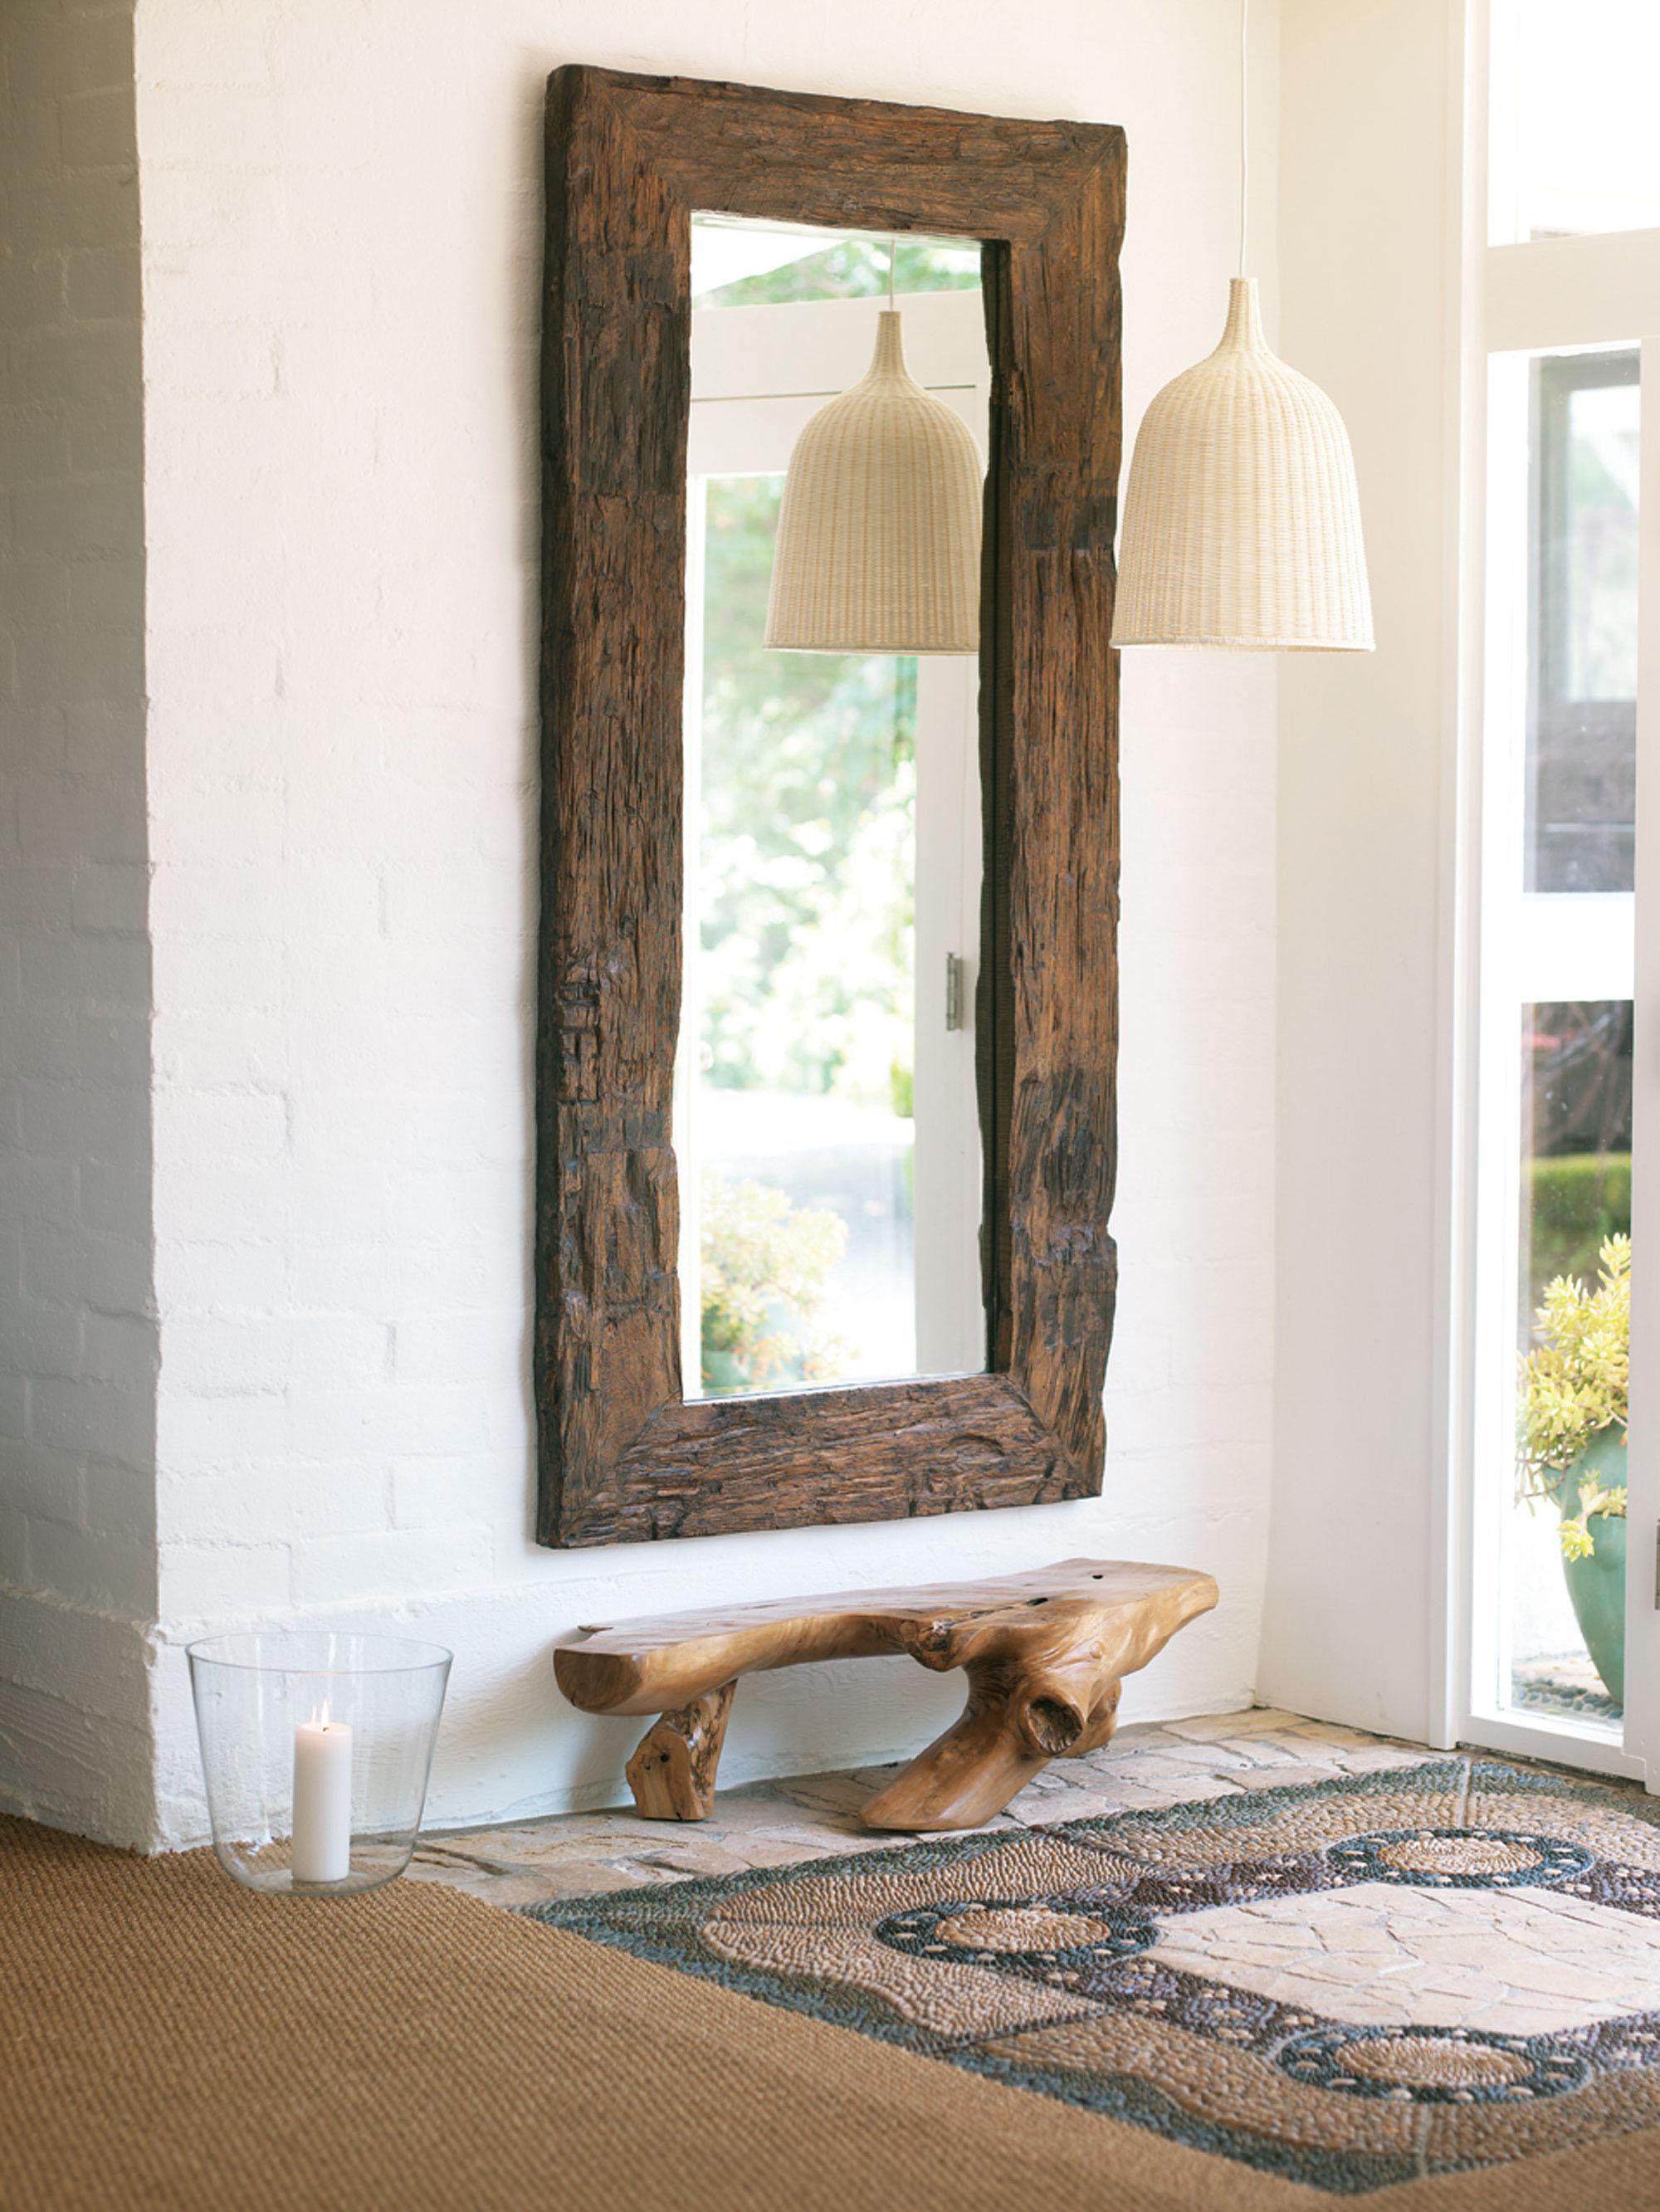 Зеркало на стене в прихожей дома